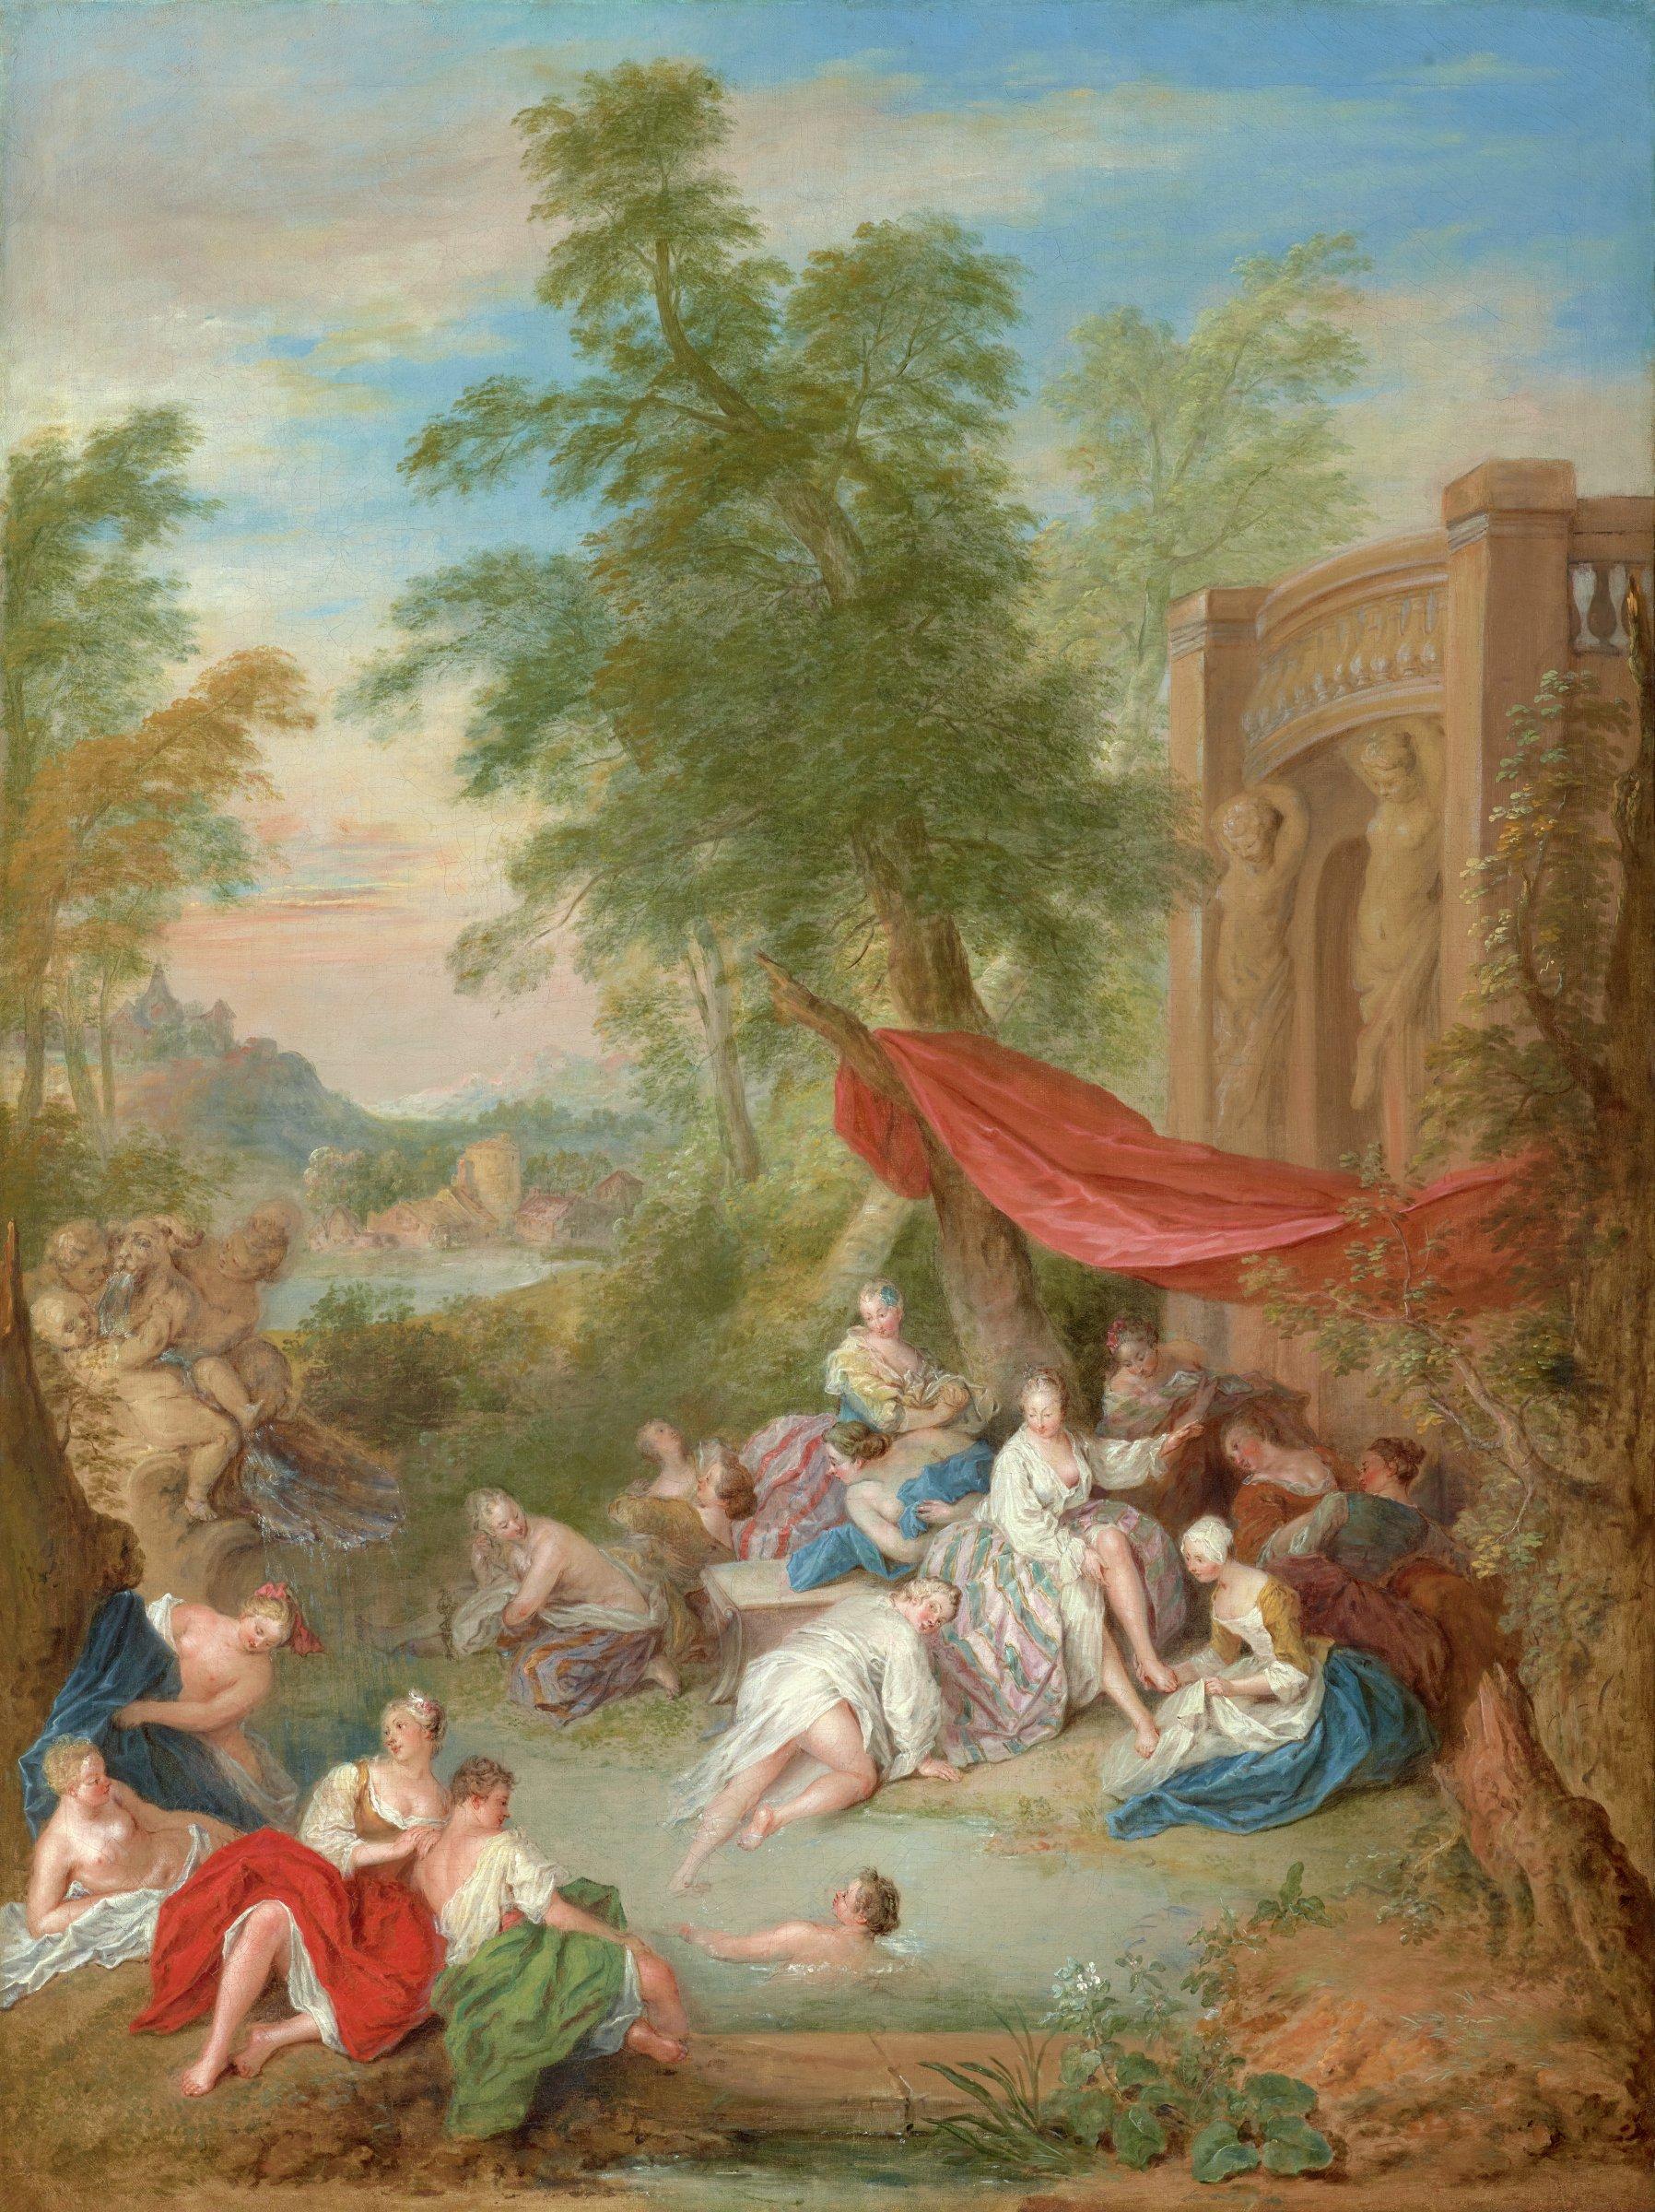 Les Baigneuses (Female Bathers in a Landscape), Jean-Baptiste Pater, oil on canvas